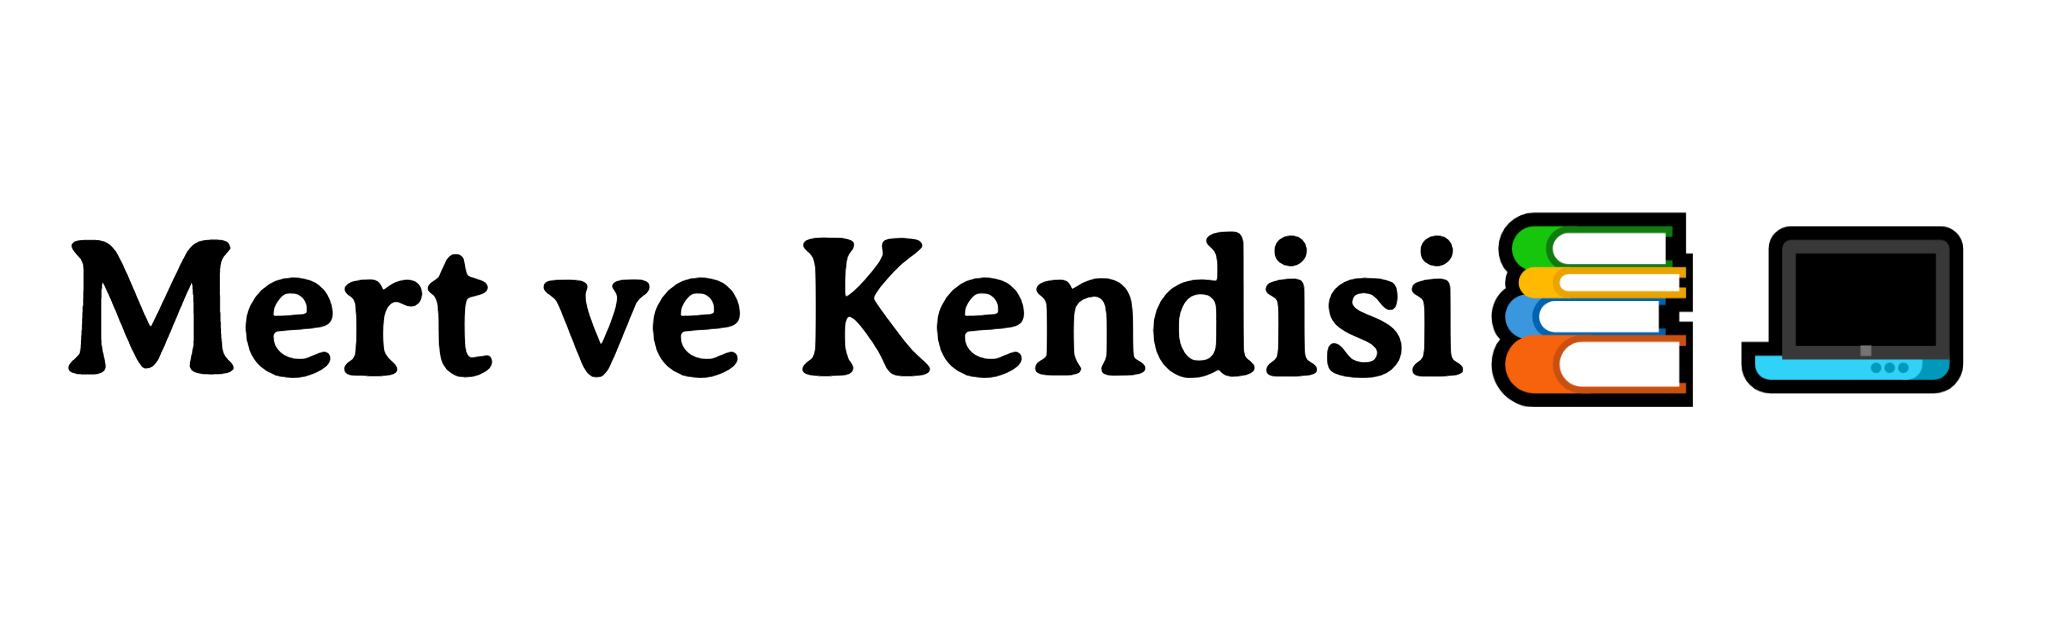 Mert ve Kendisi